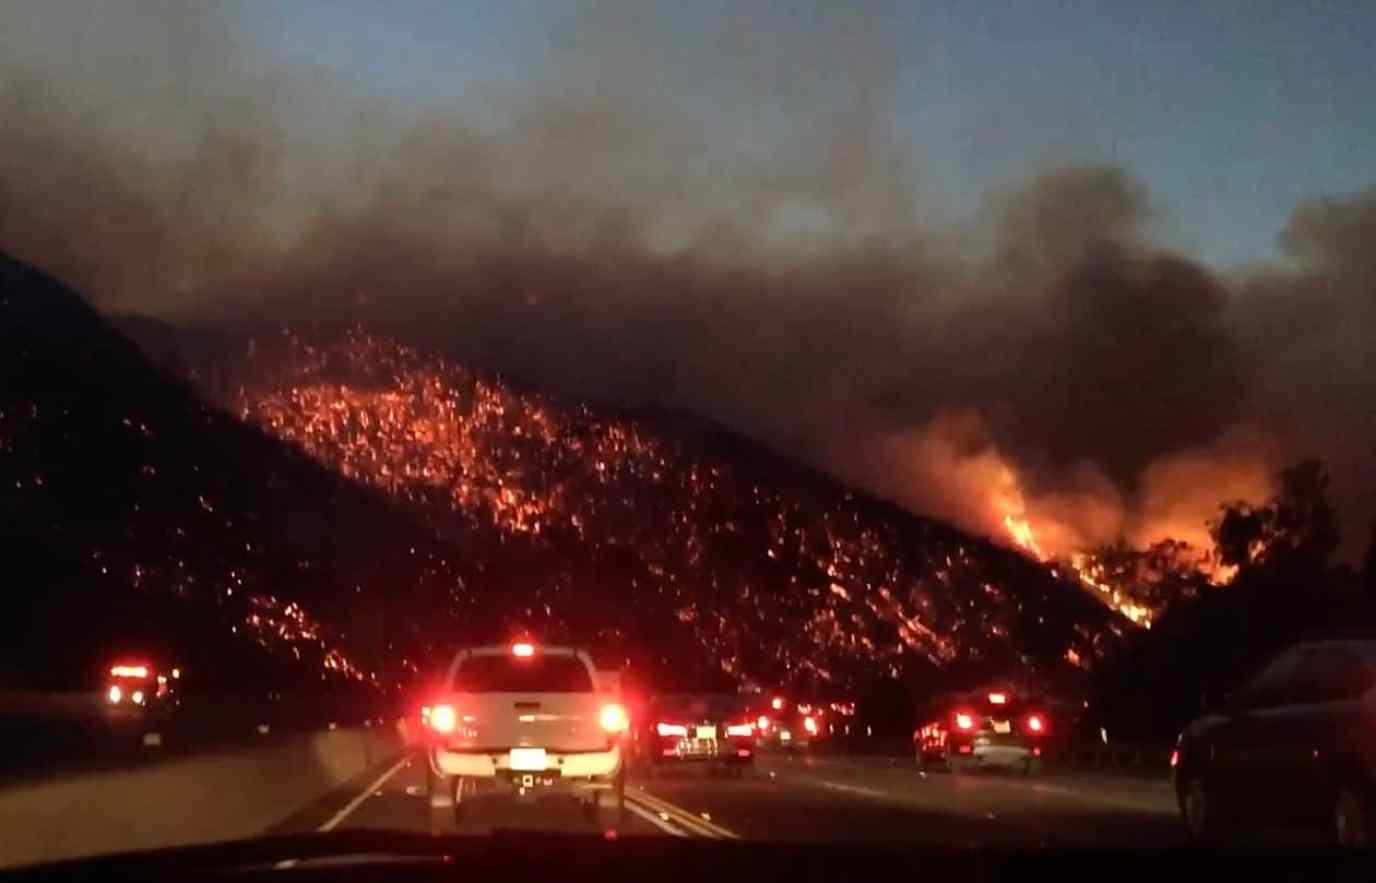 405 freeway fire